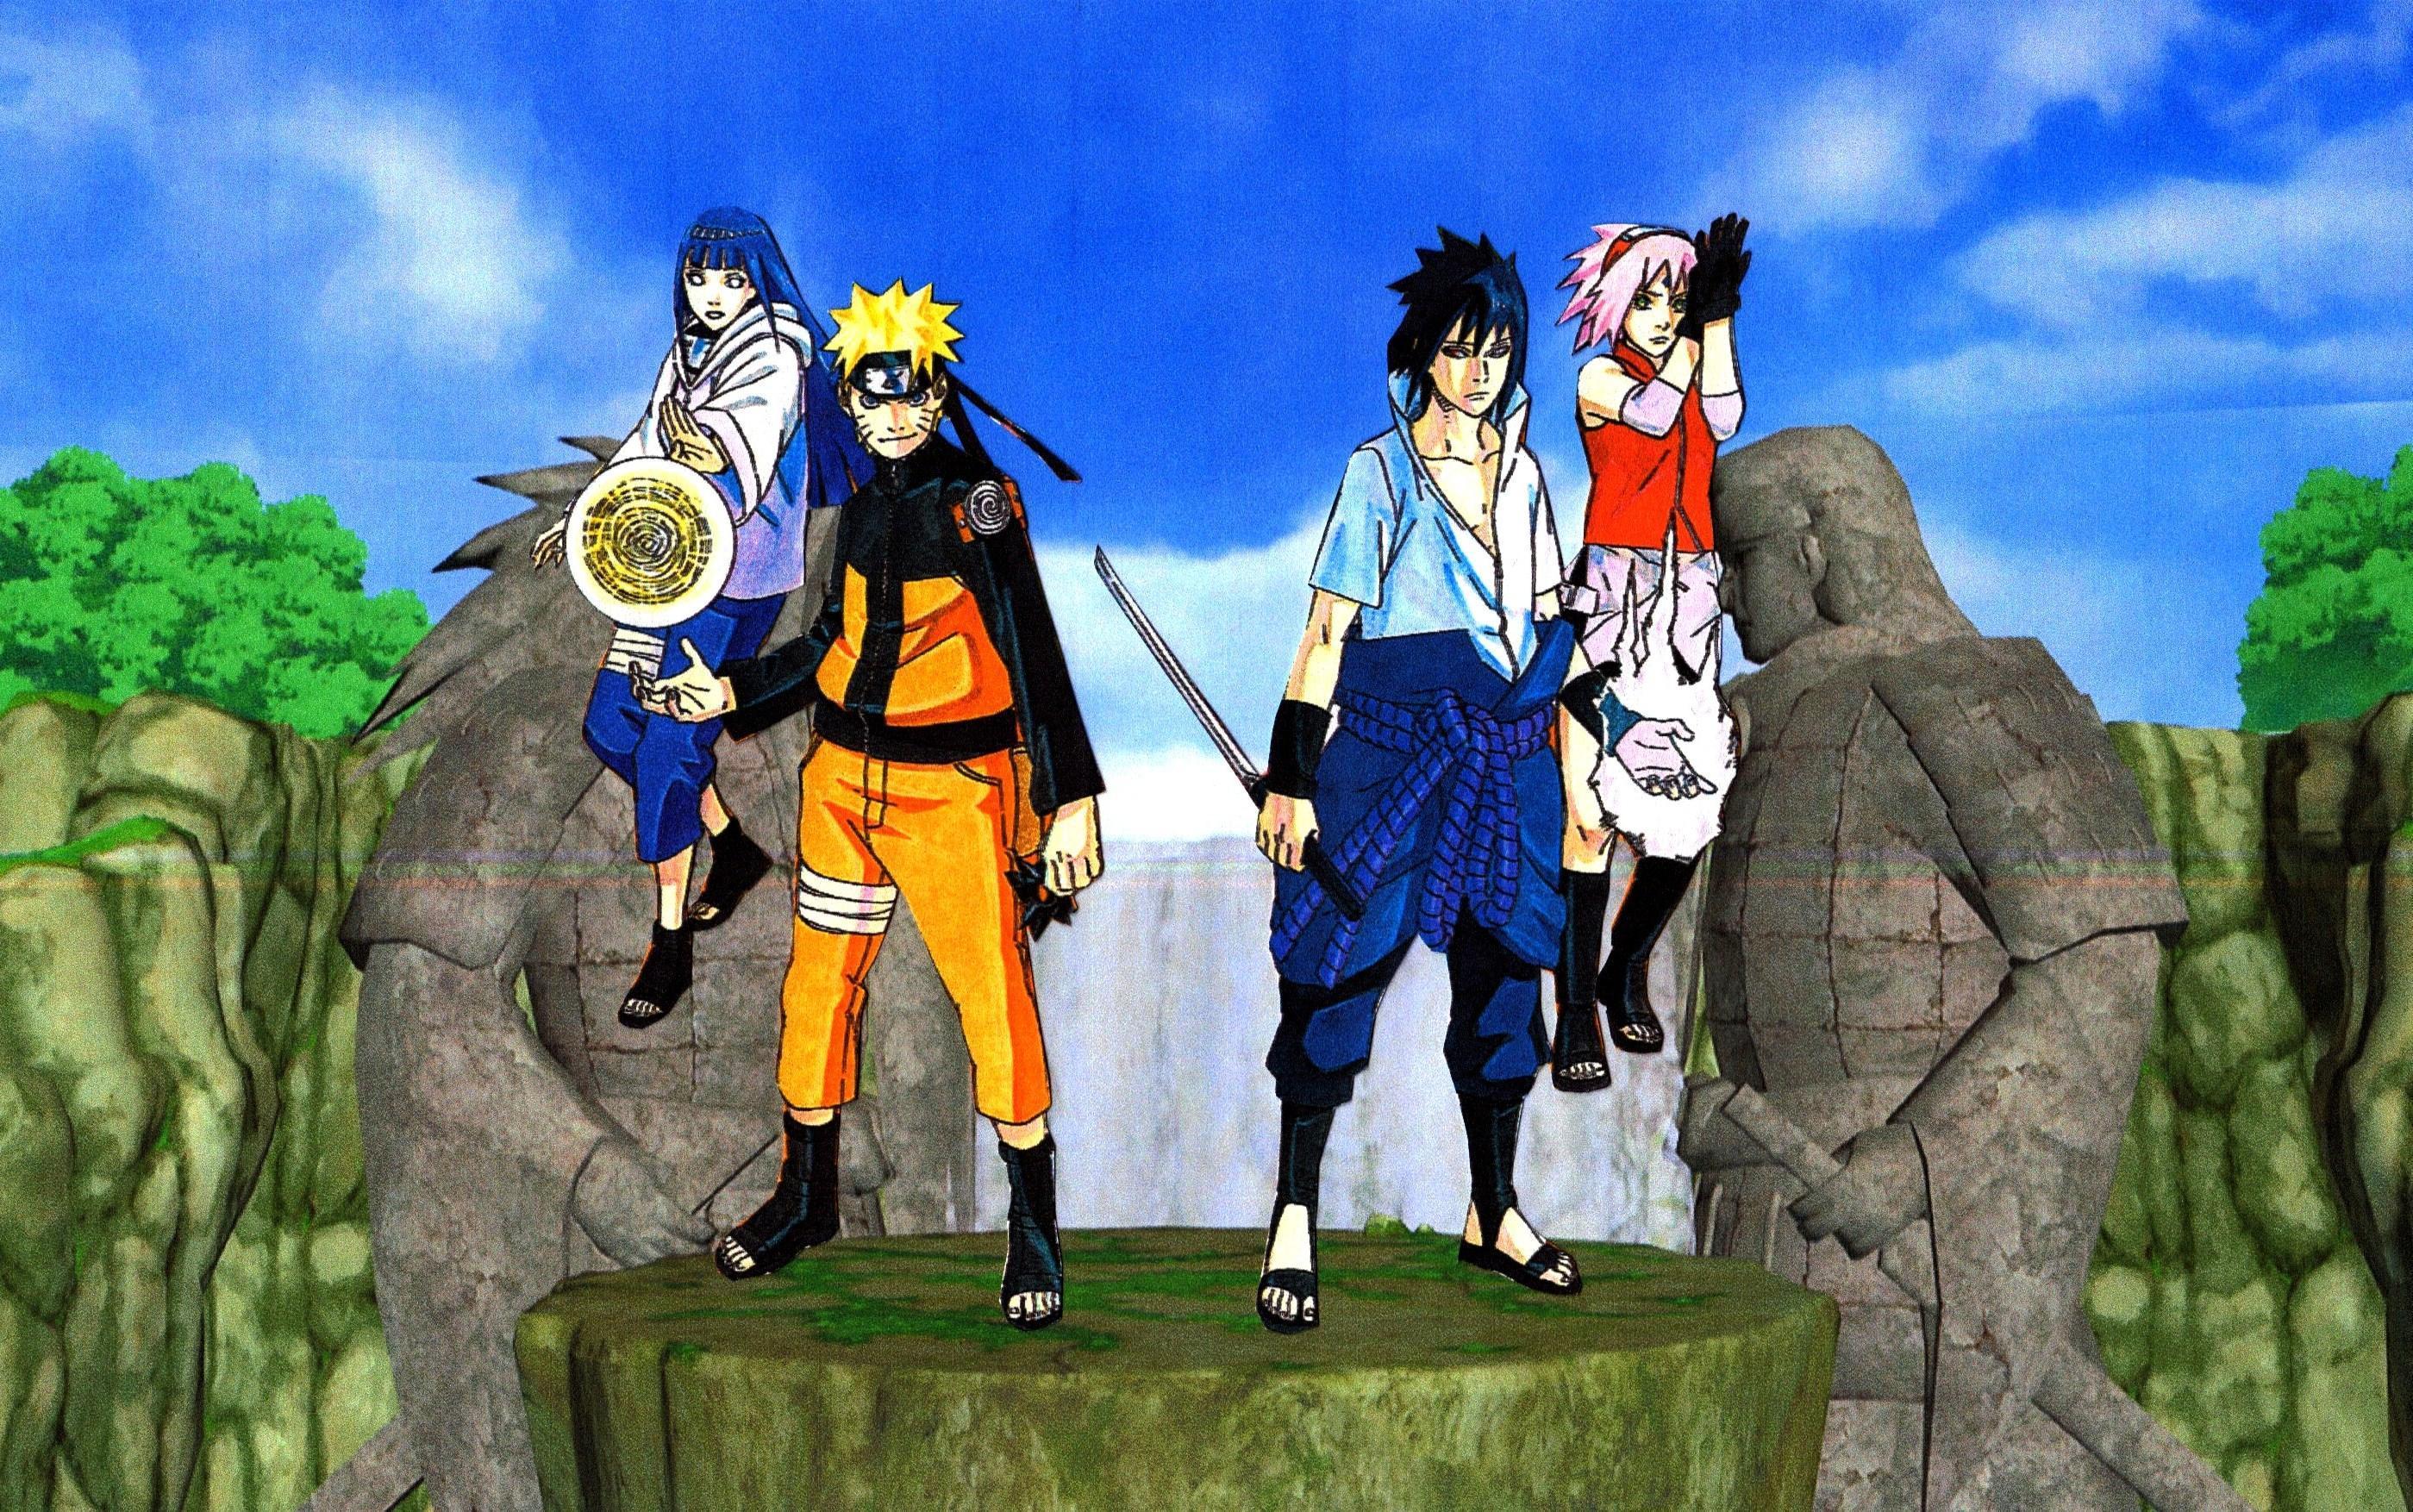 Naruto Hinata Sasuke Sakura Wallpaper 2 by weissdrum 2799x1754